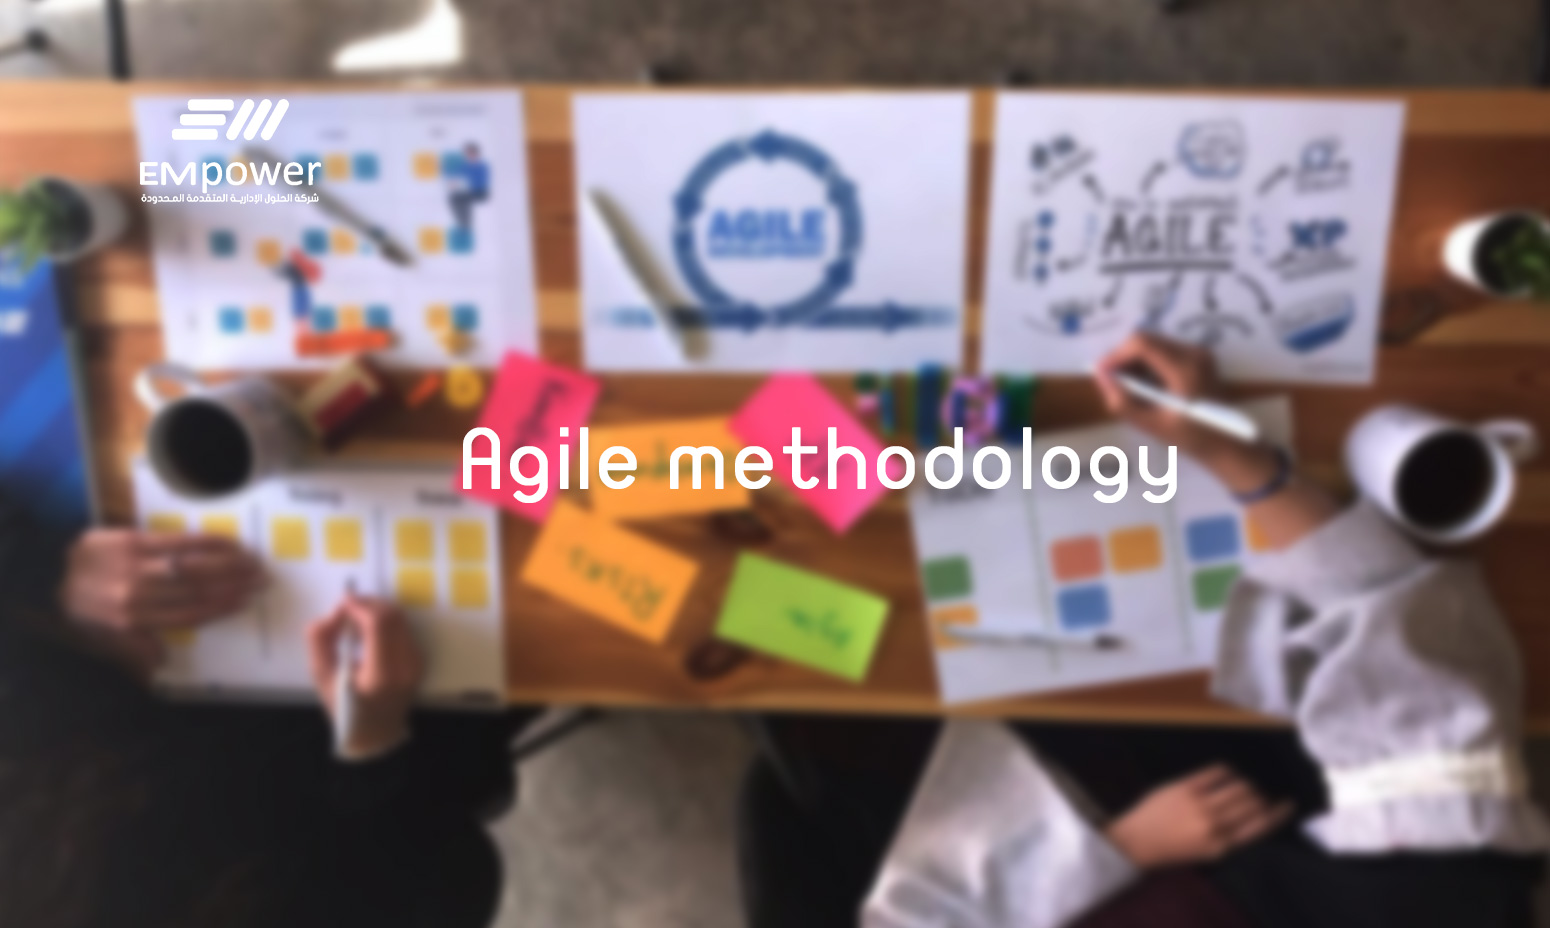 Agile methodology - تأسيس مكاتب إدارة المشاريع PMO